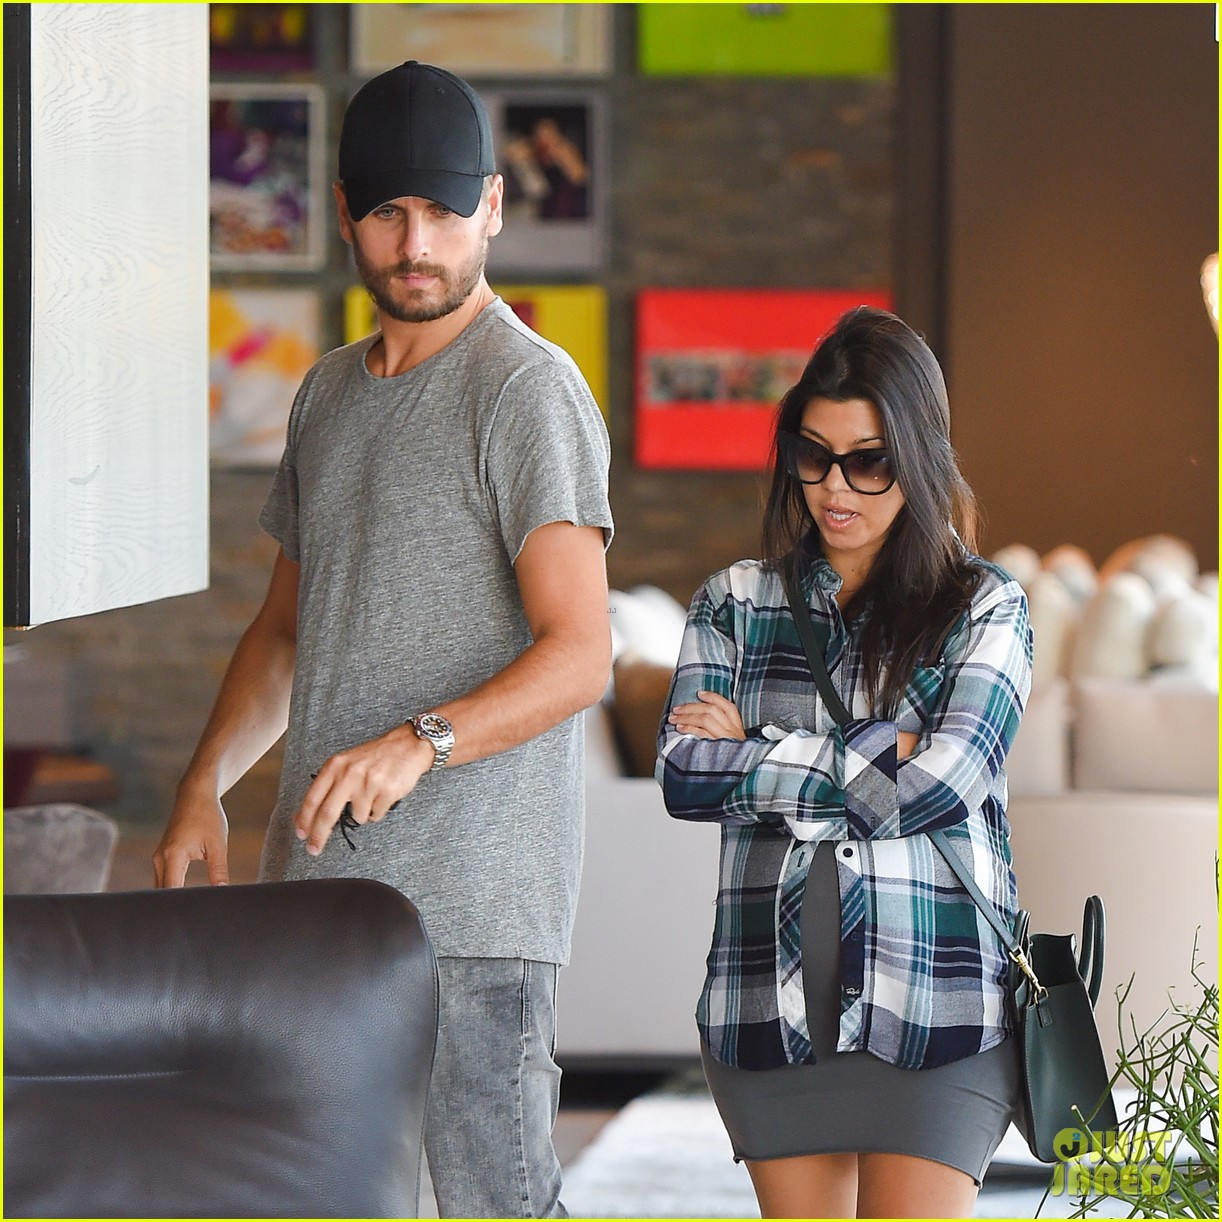 Kourtney Kardashian U0026 Scott Disick Go Furniture Shopping For Expanding  Family